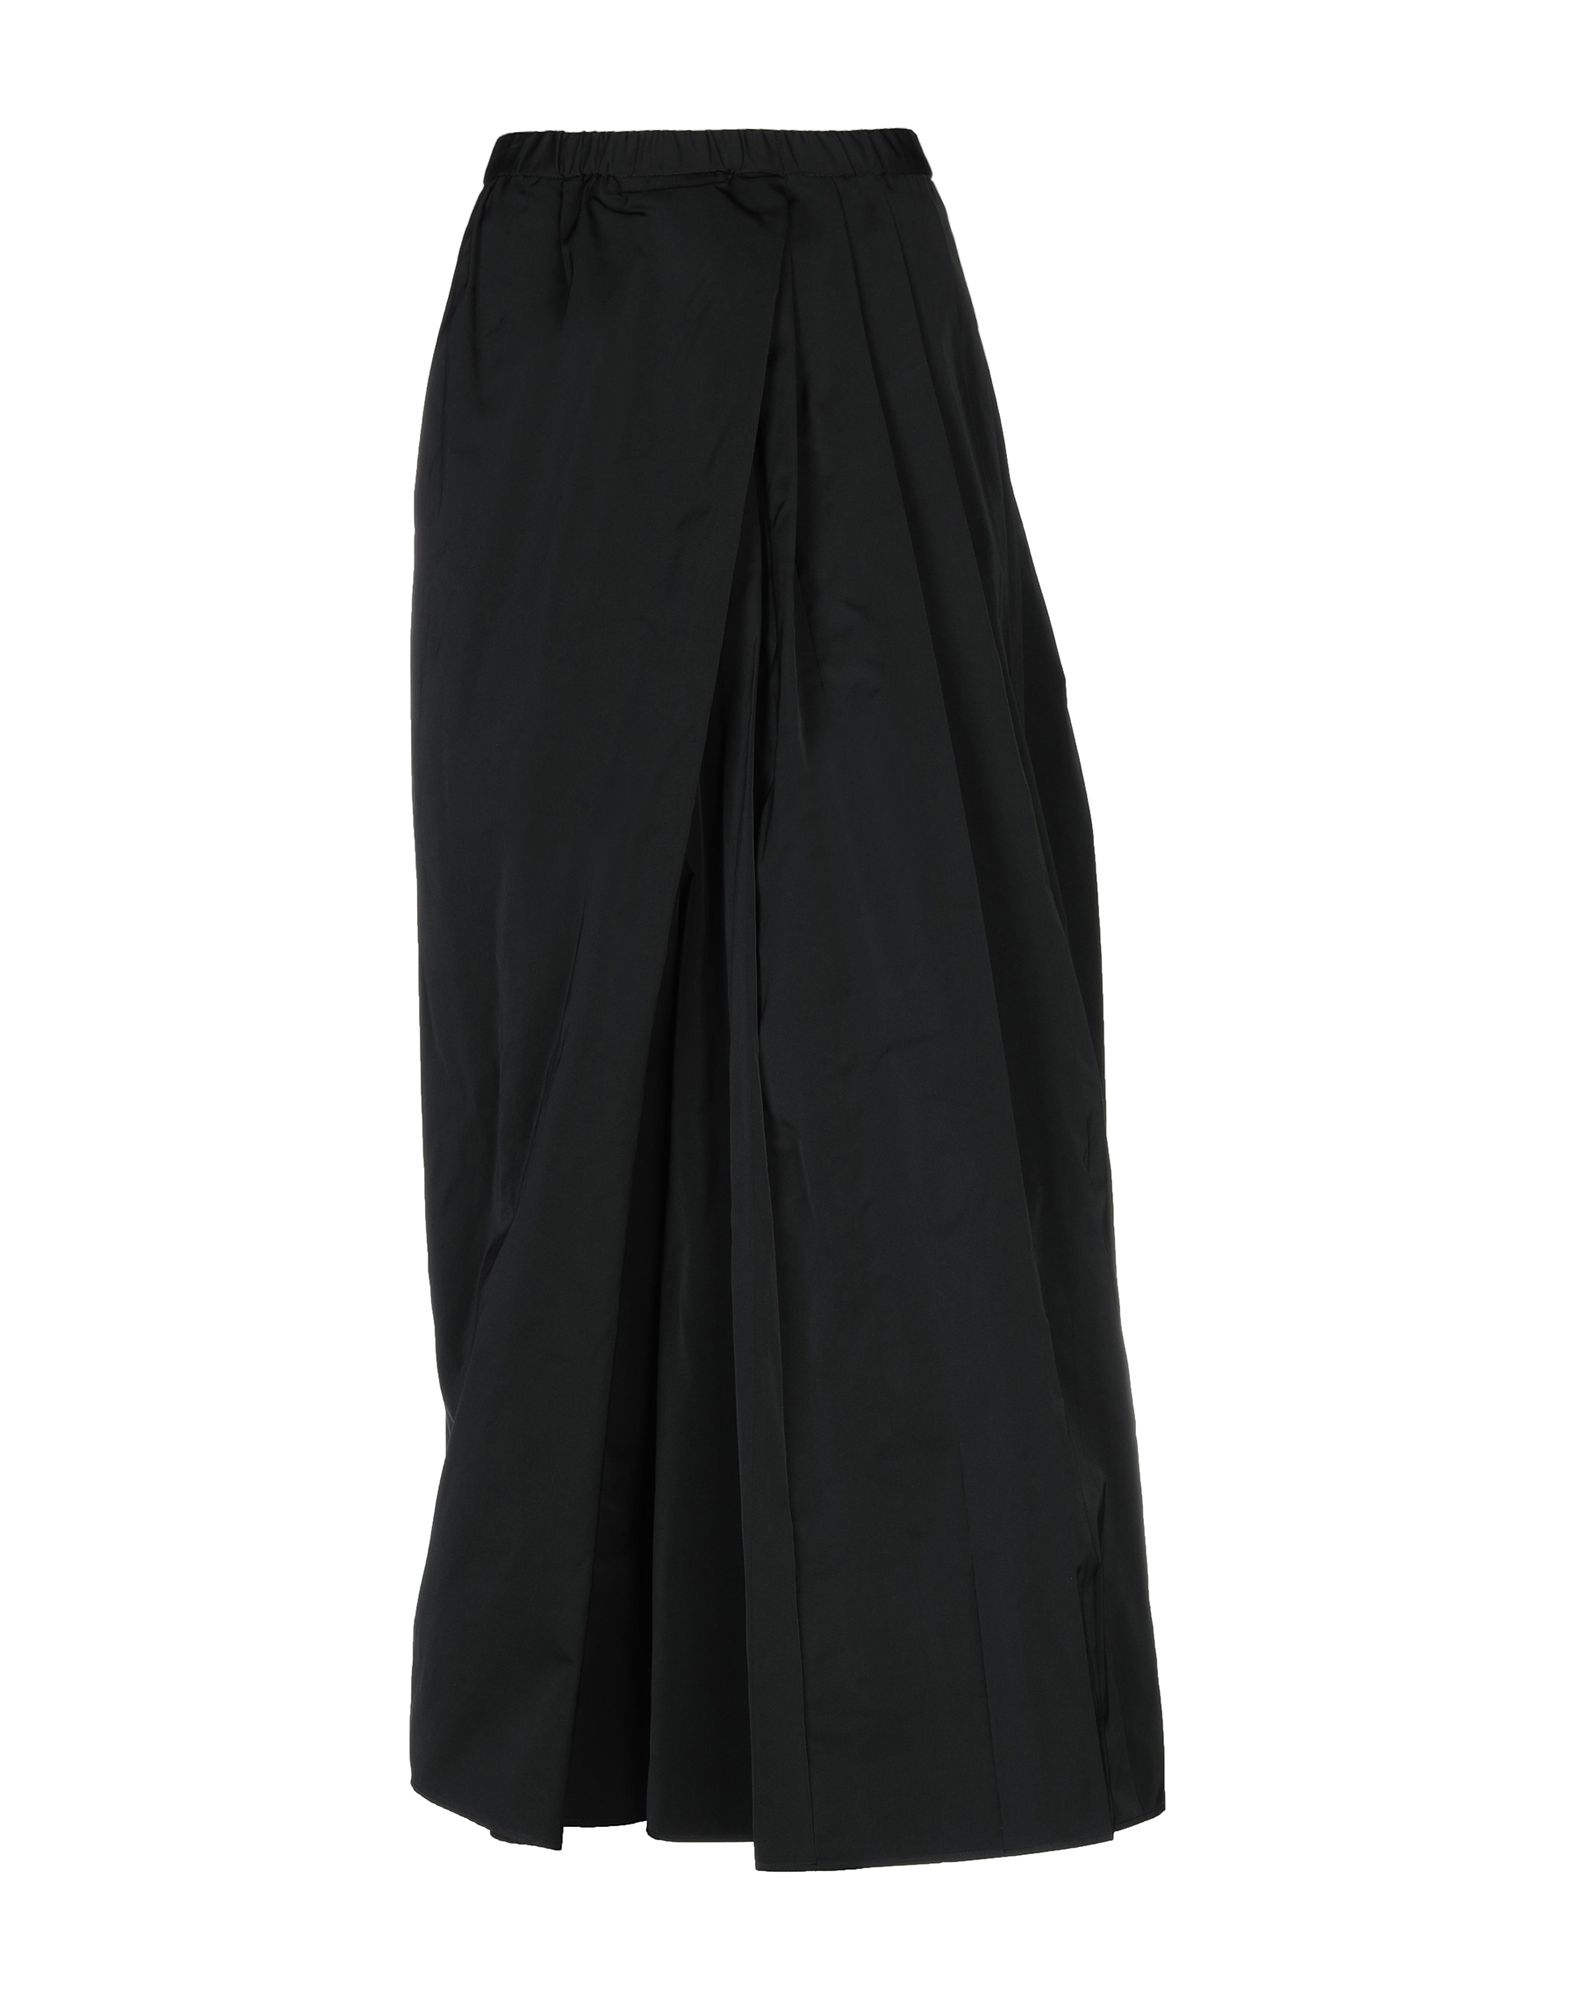 N°21 Длинная юбка юбка n°21 юбки прямые